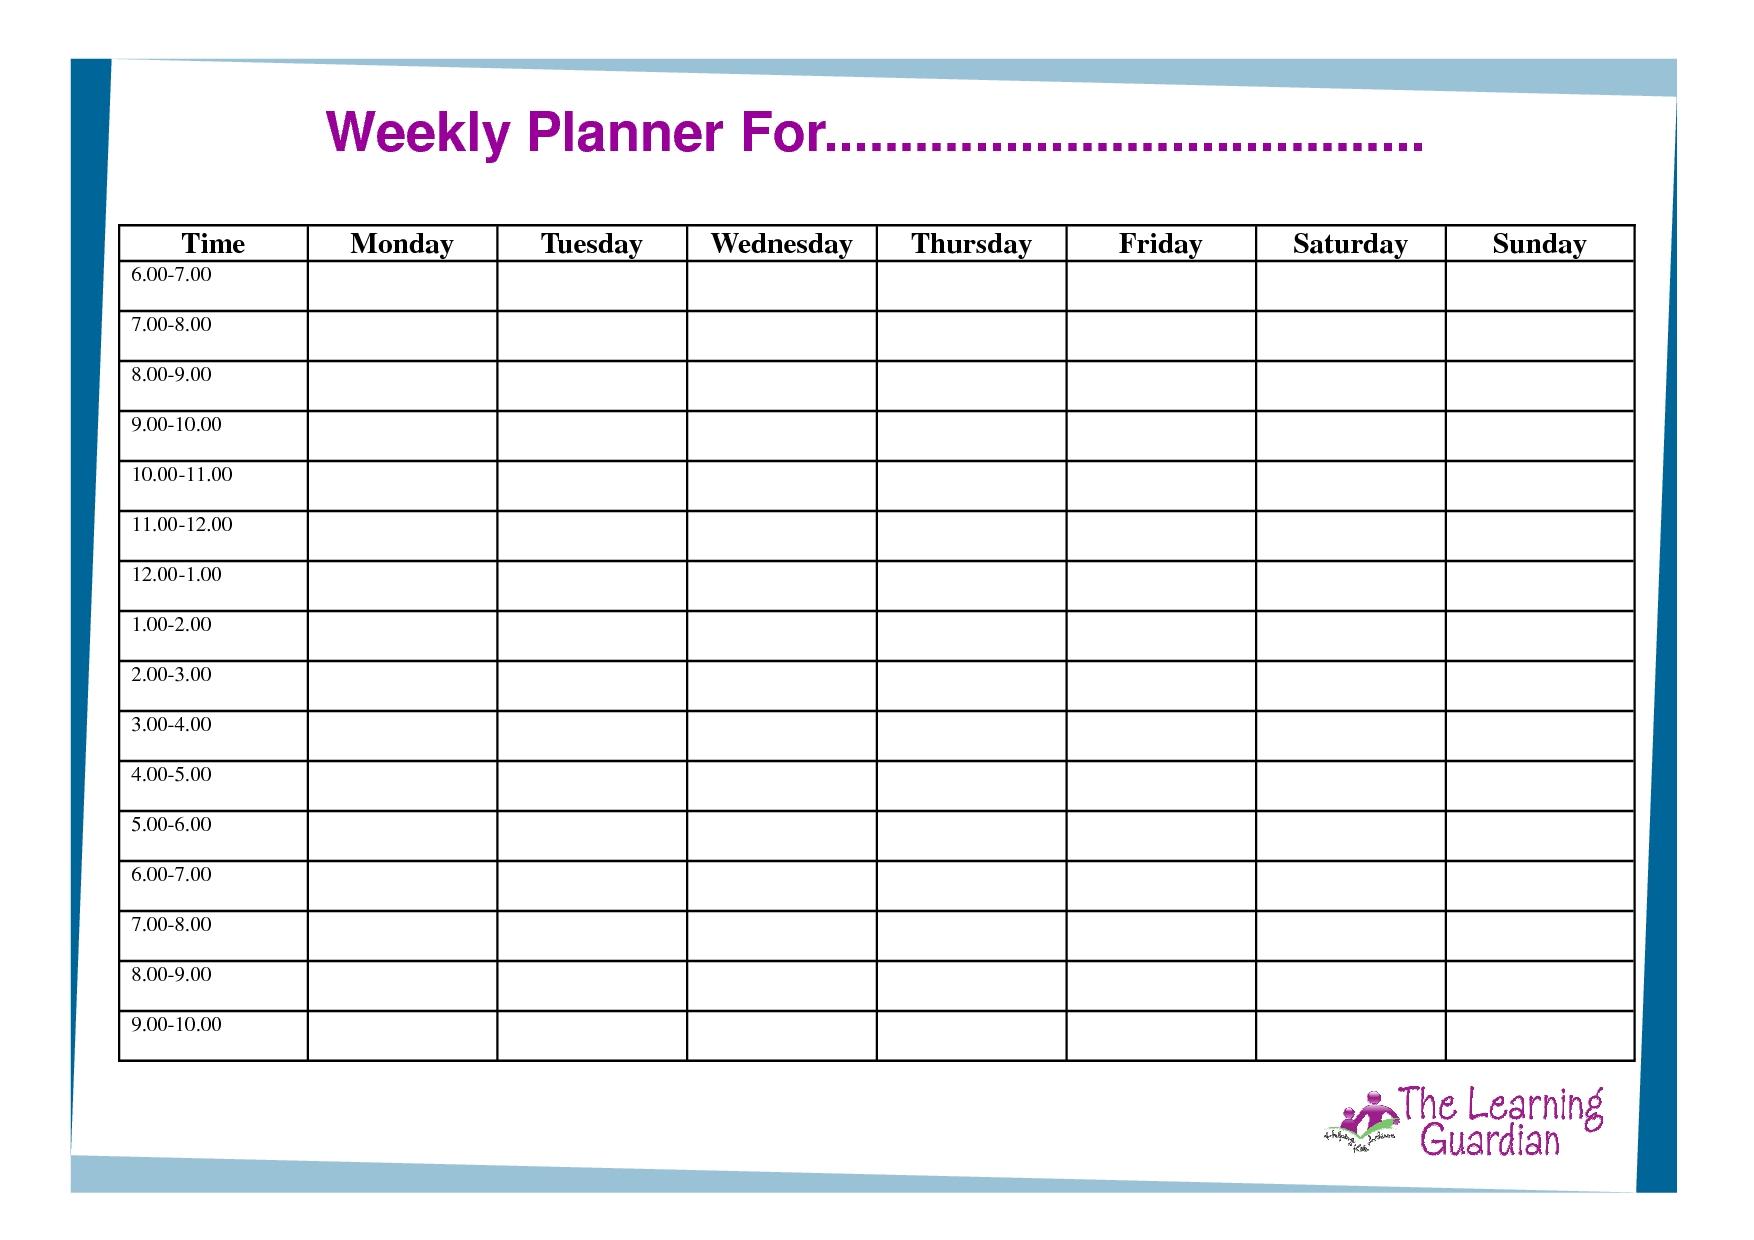 Free Printable Weekly Calendar Templates | Weekly Planner For Time regarding Printable Weekly Planner With Time Slots